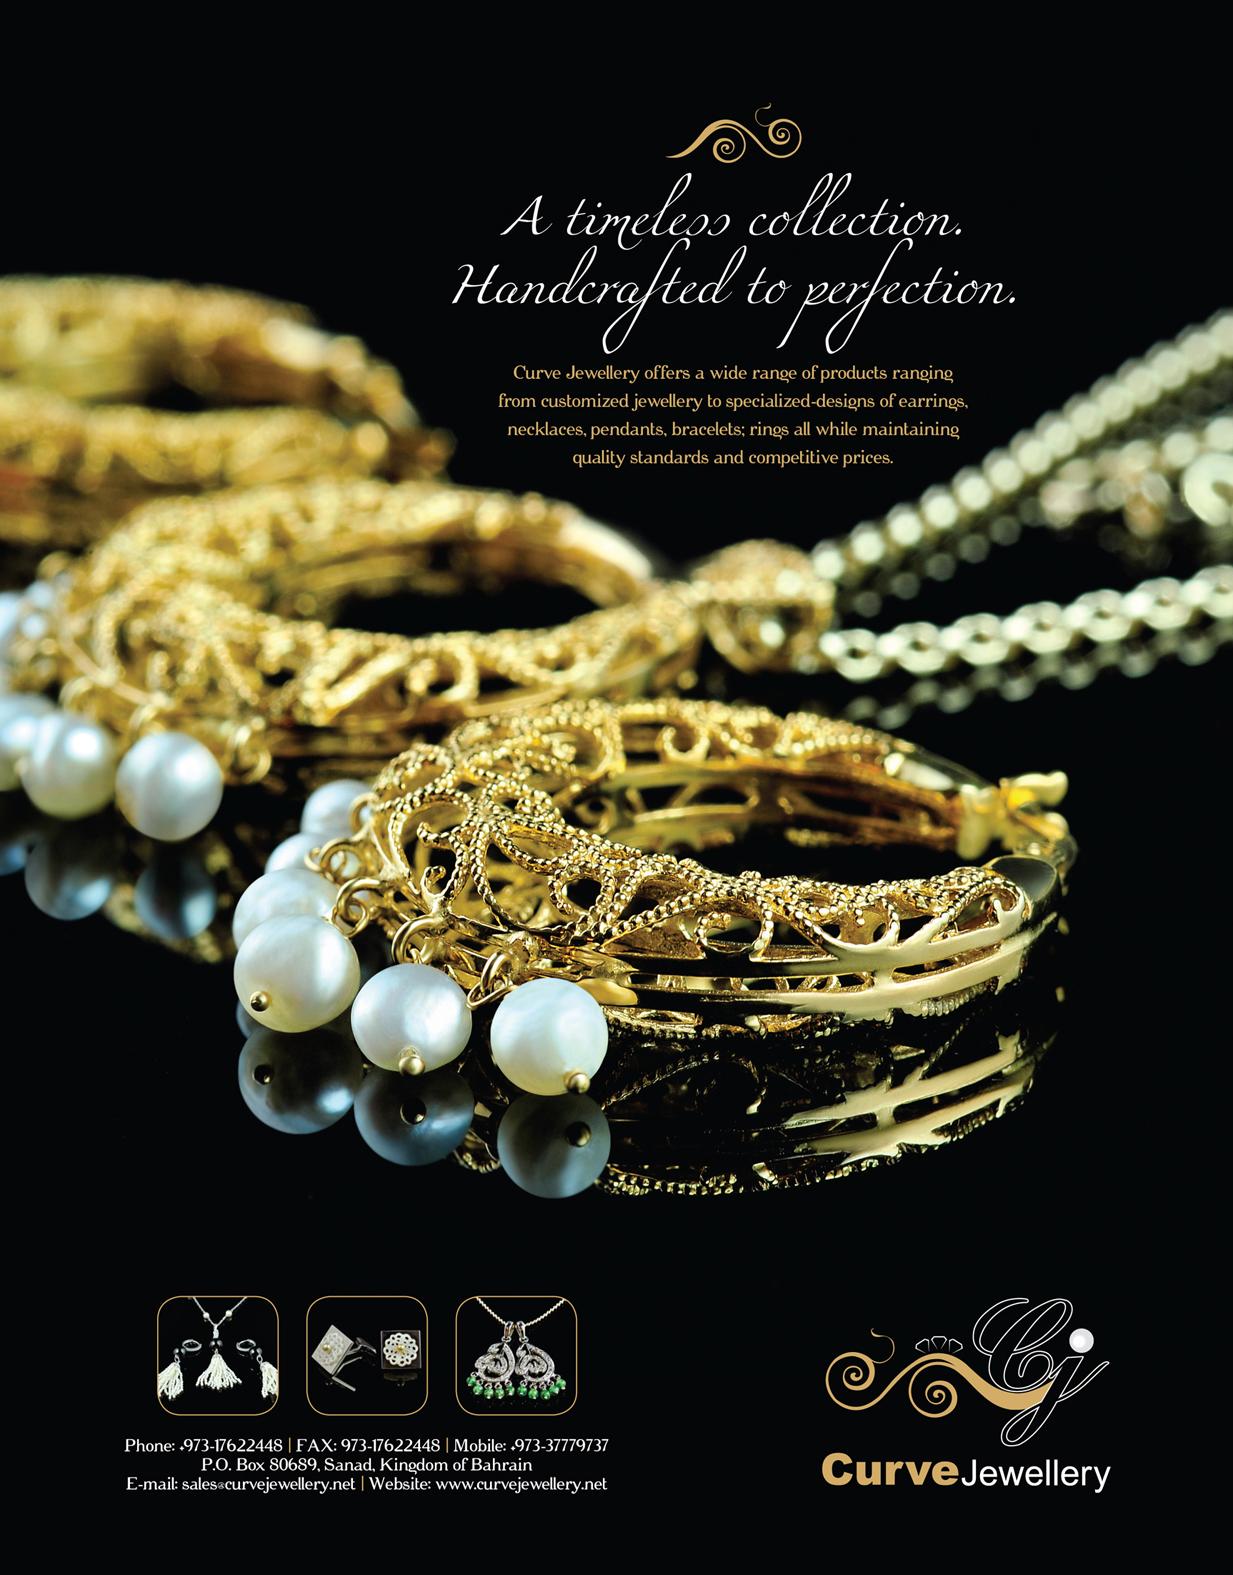 rajeevlalith: Cj- Curve Jewellery Bahrain